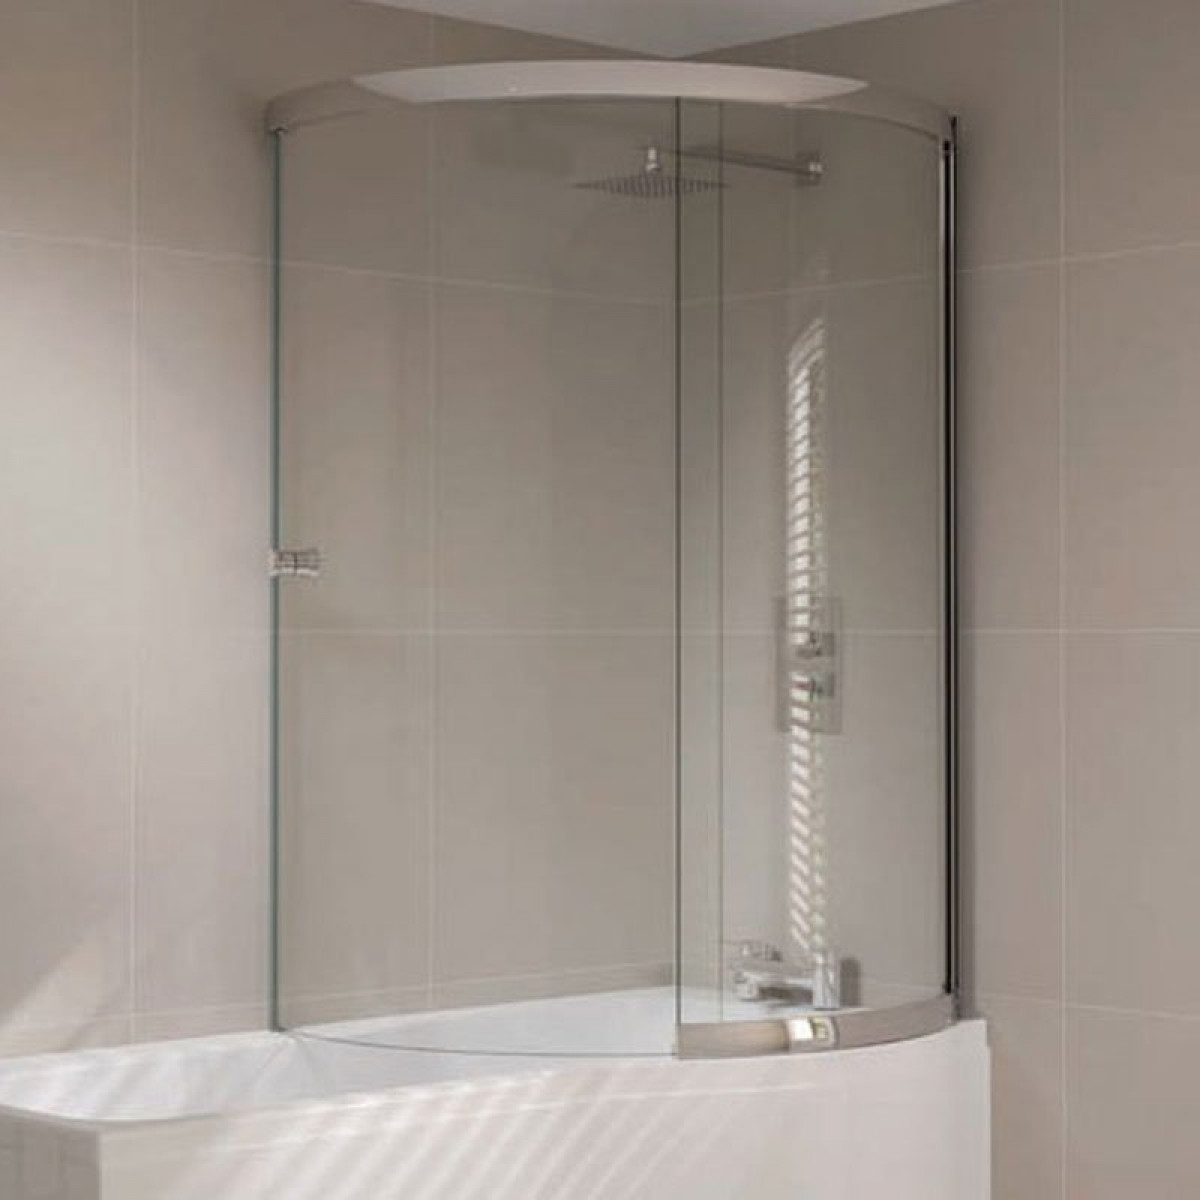 P Shaped Bath Shower Screen - home decor - Mrsilva.us